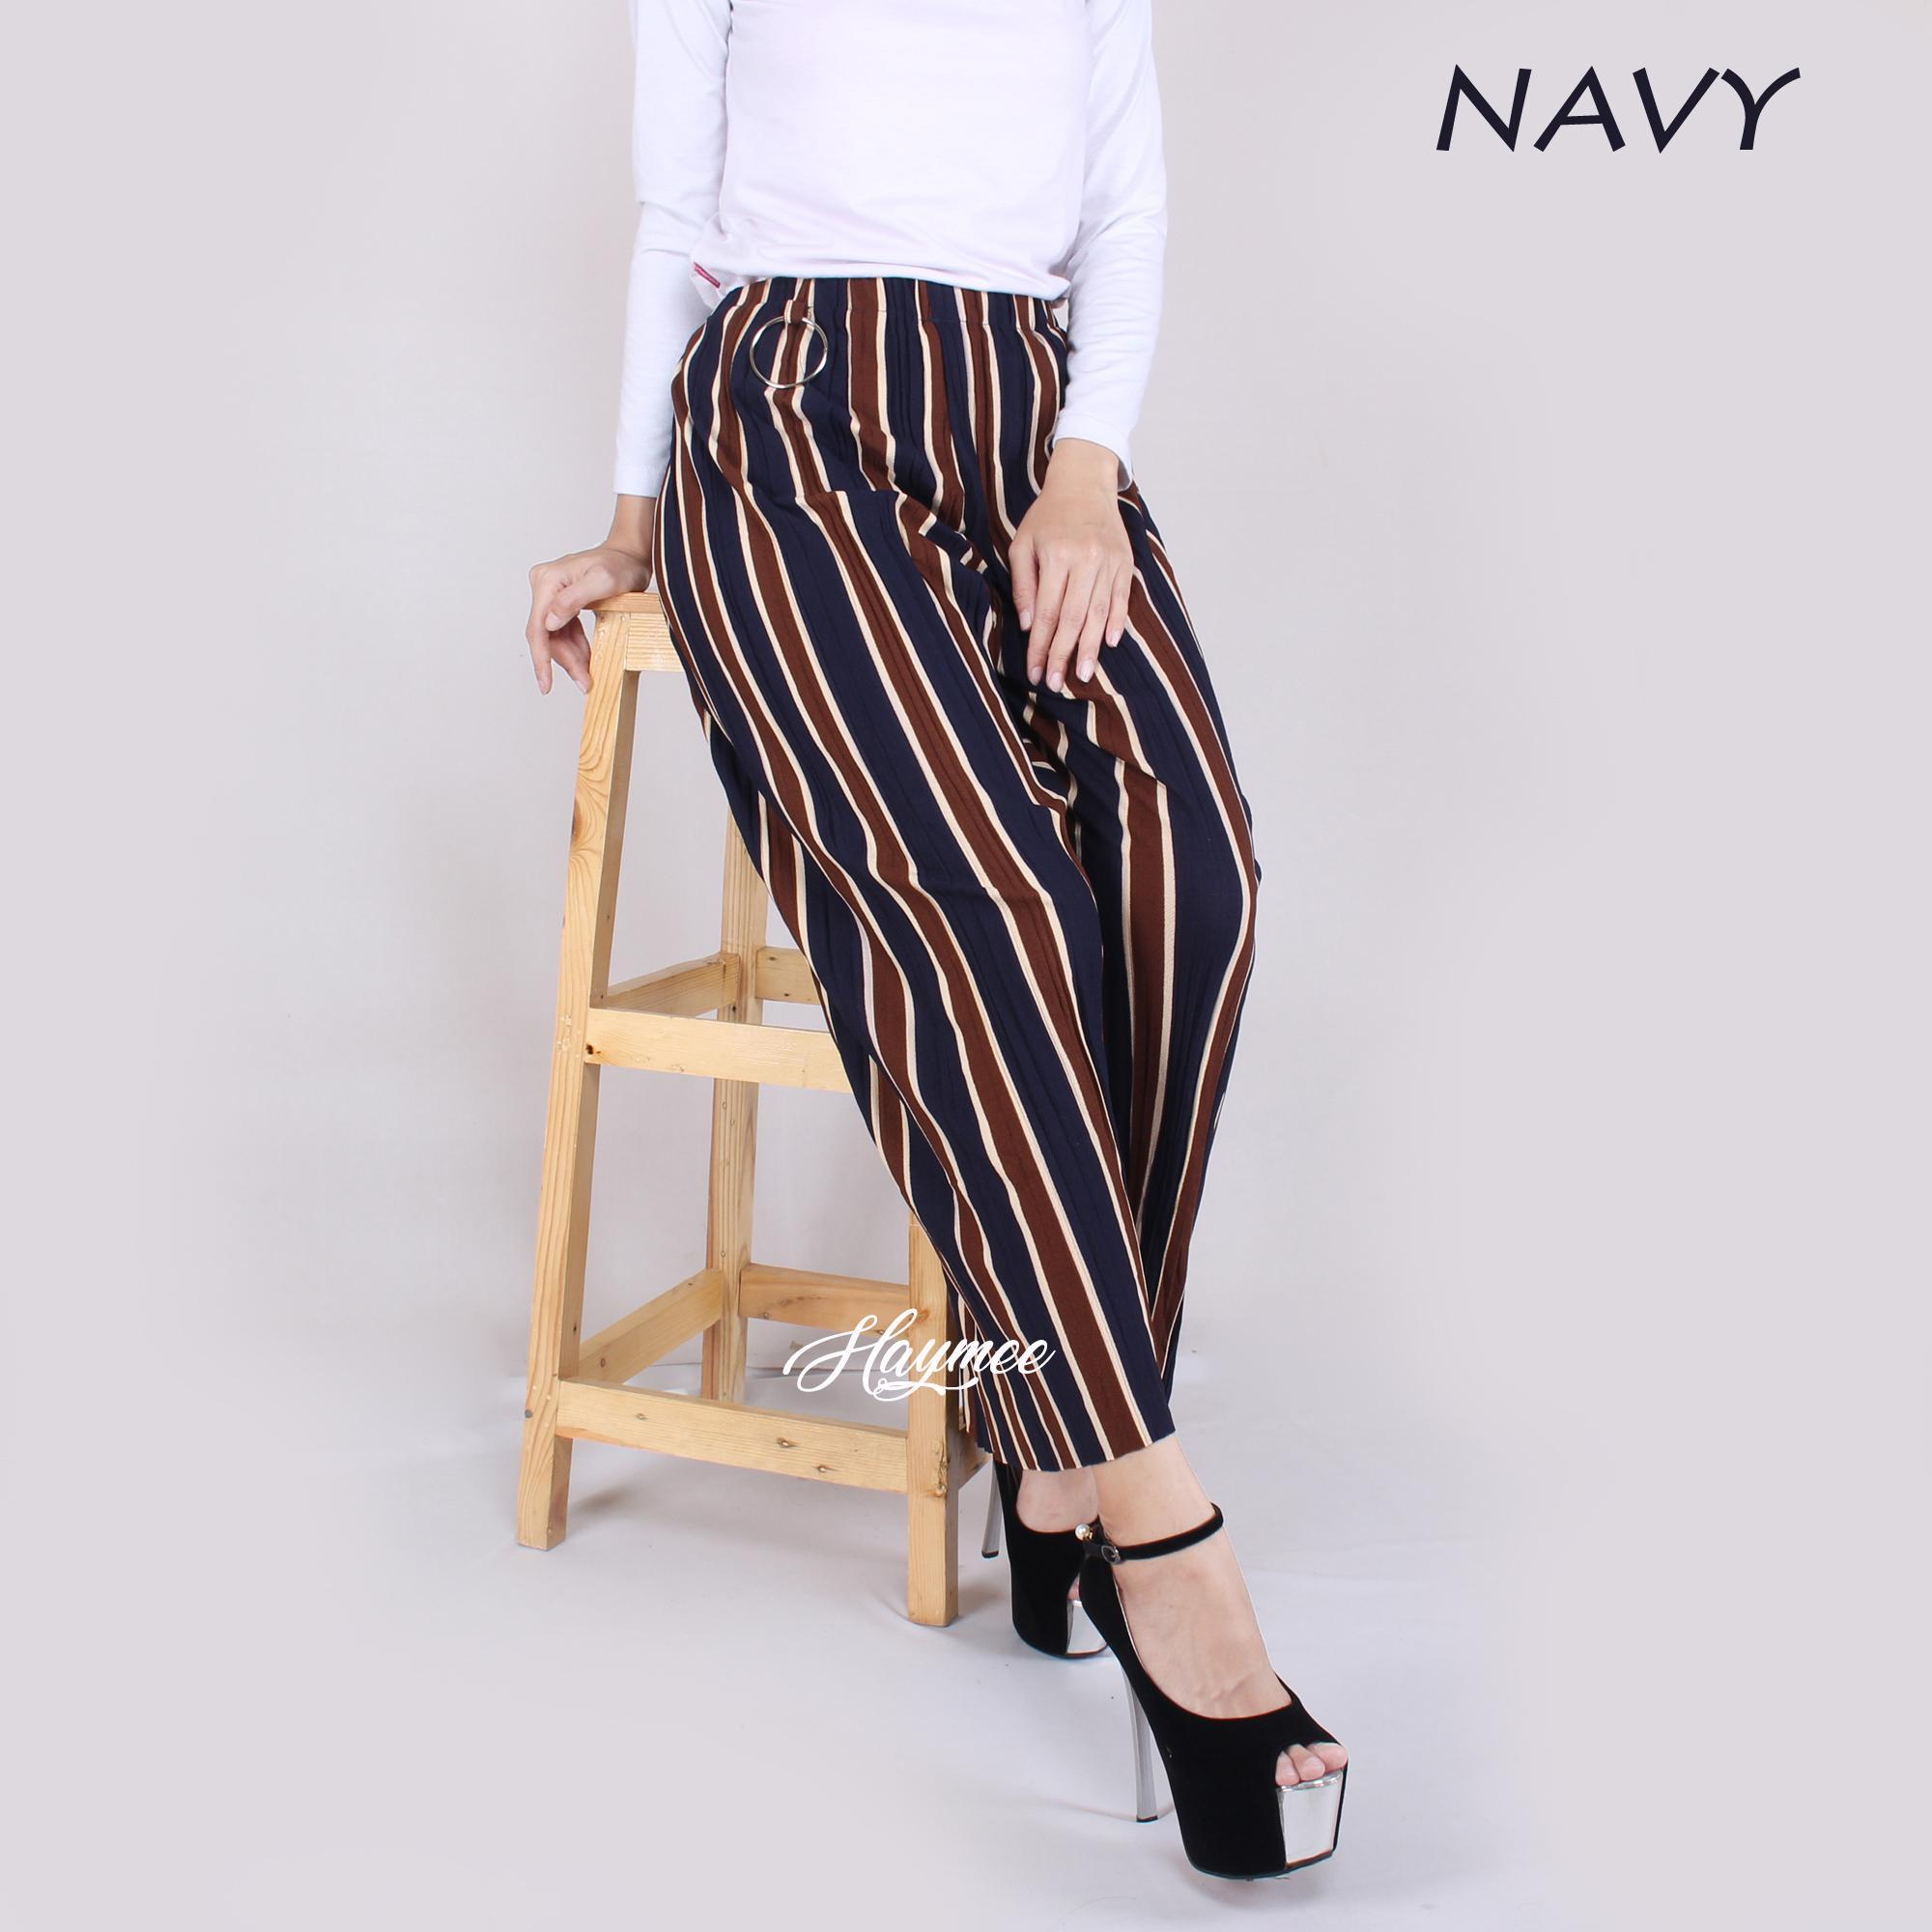 Moi Style Pleated Long Culotte Pants Celana Kulot Plisket Wolycrep High Quality Clothing Bcpj18100 Inc 5976 Salur Wanita Pleats Cullot Cewek Pinggang Tali